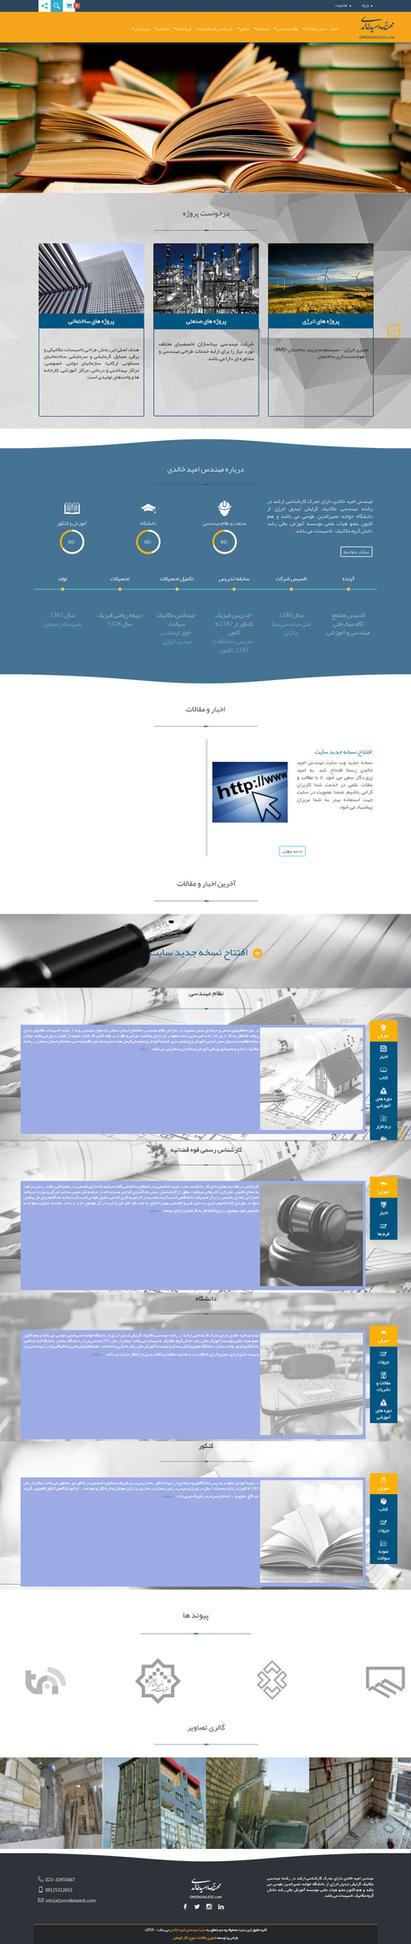 Flat Design Website by mojnegar